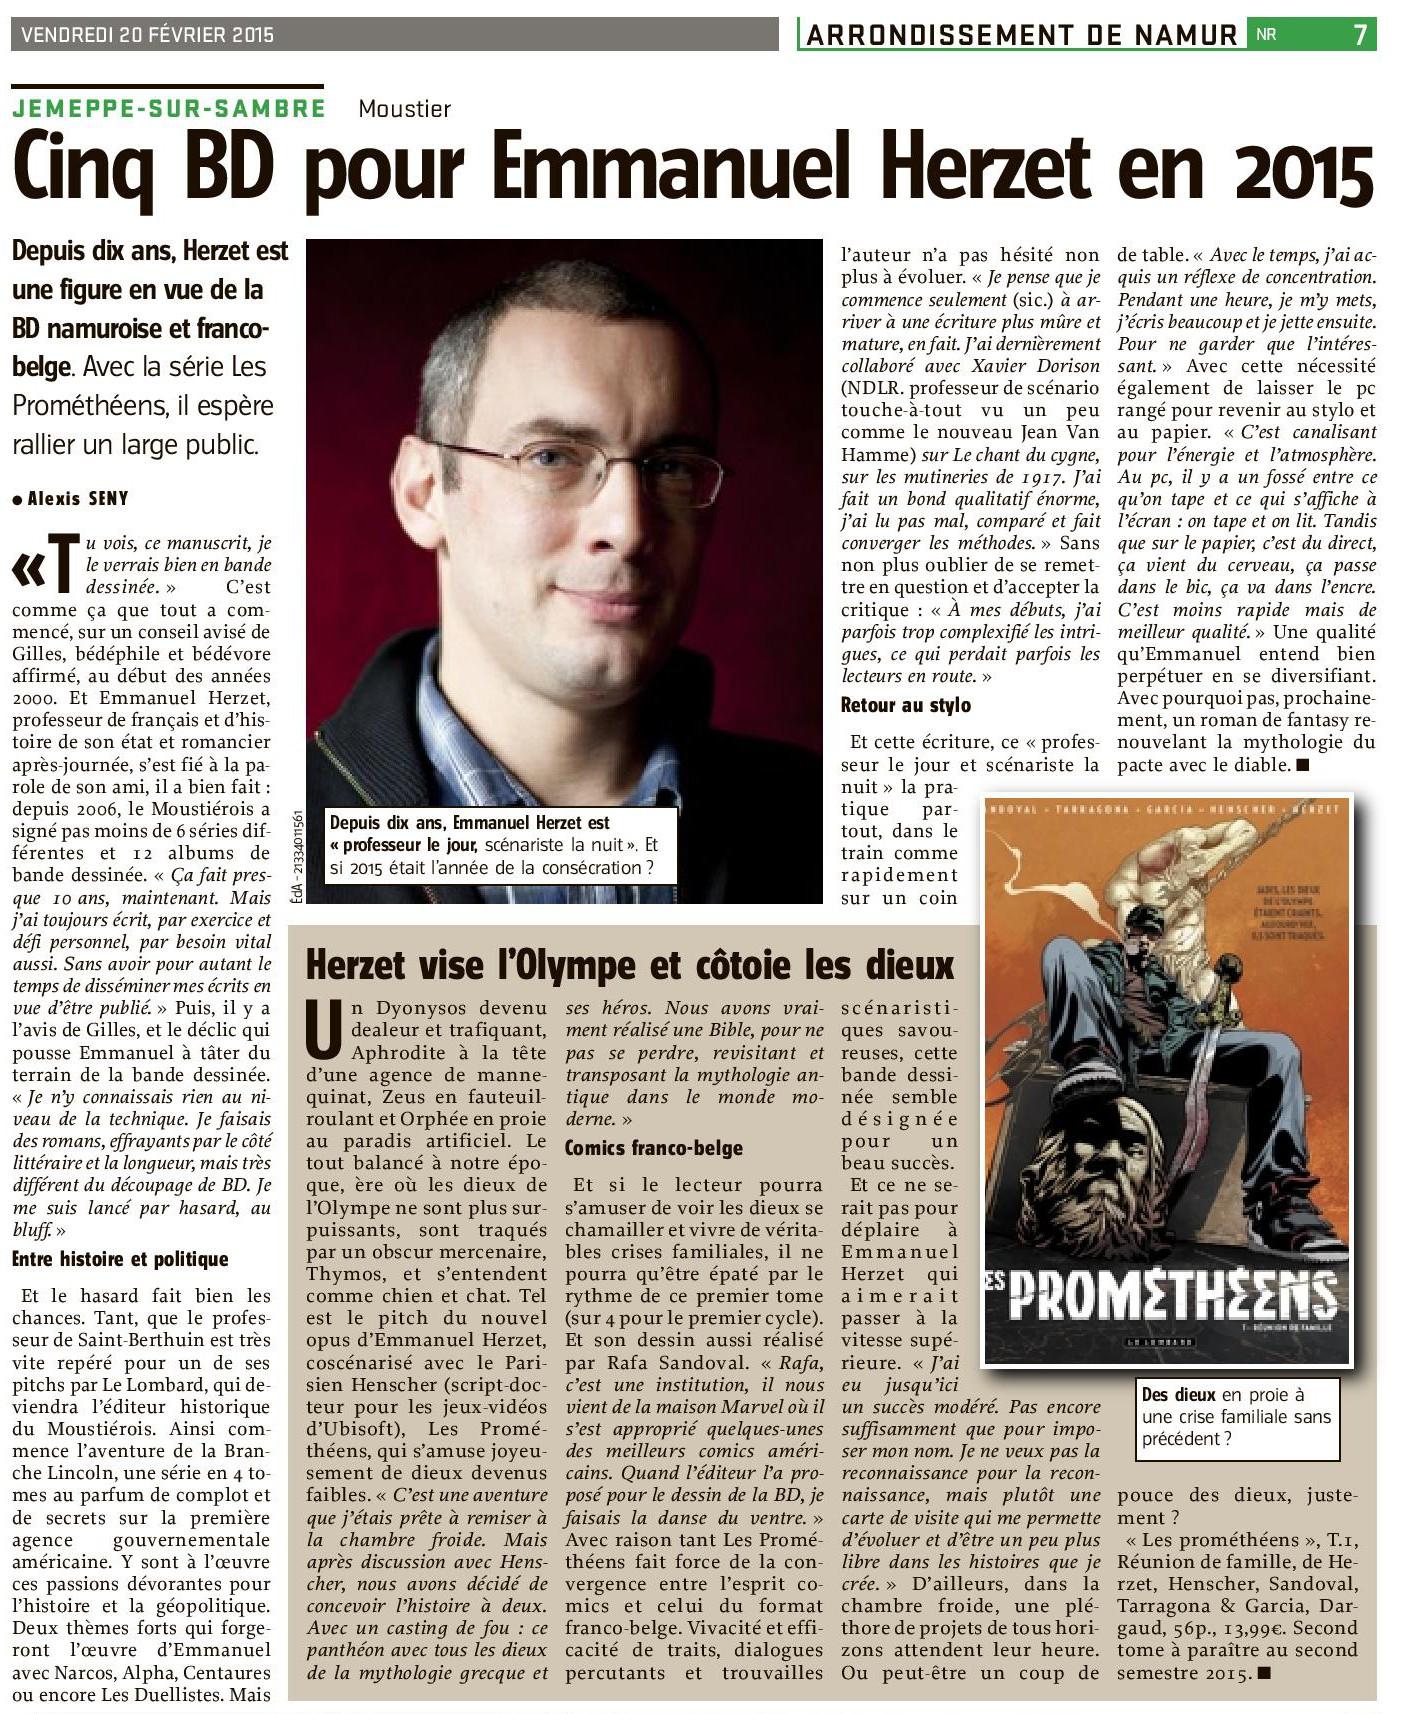 Emmanuel Herzet - Les Prométhéens - Article L'Avenir